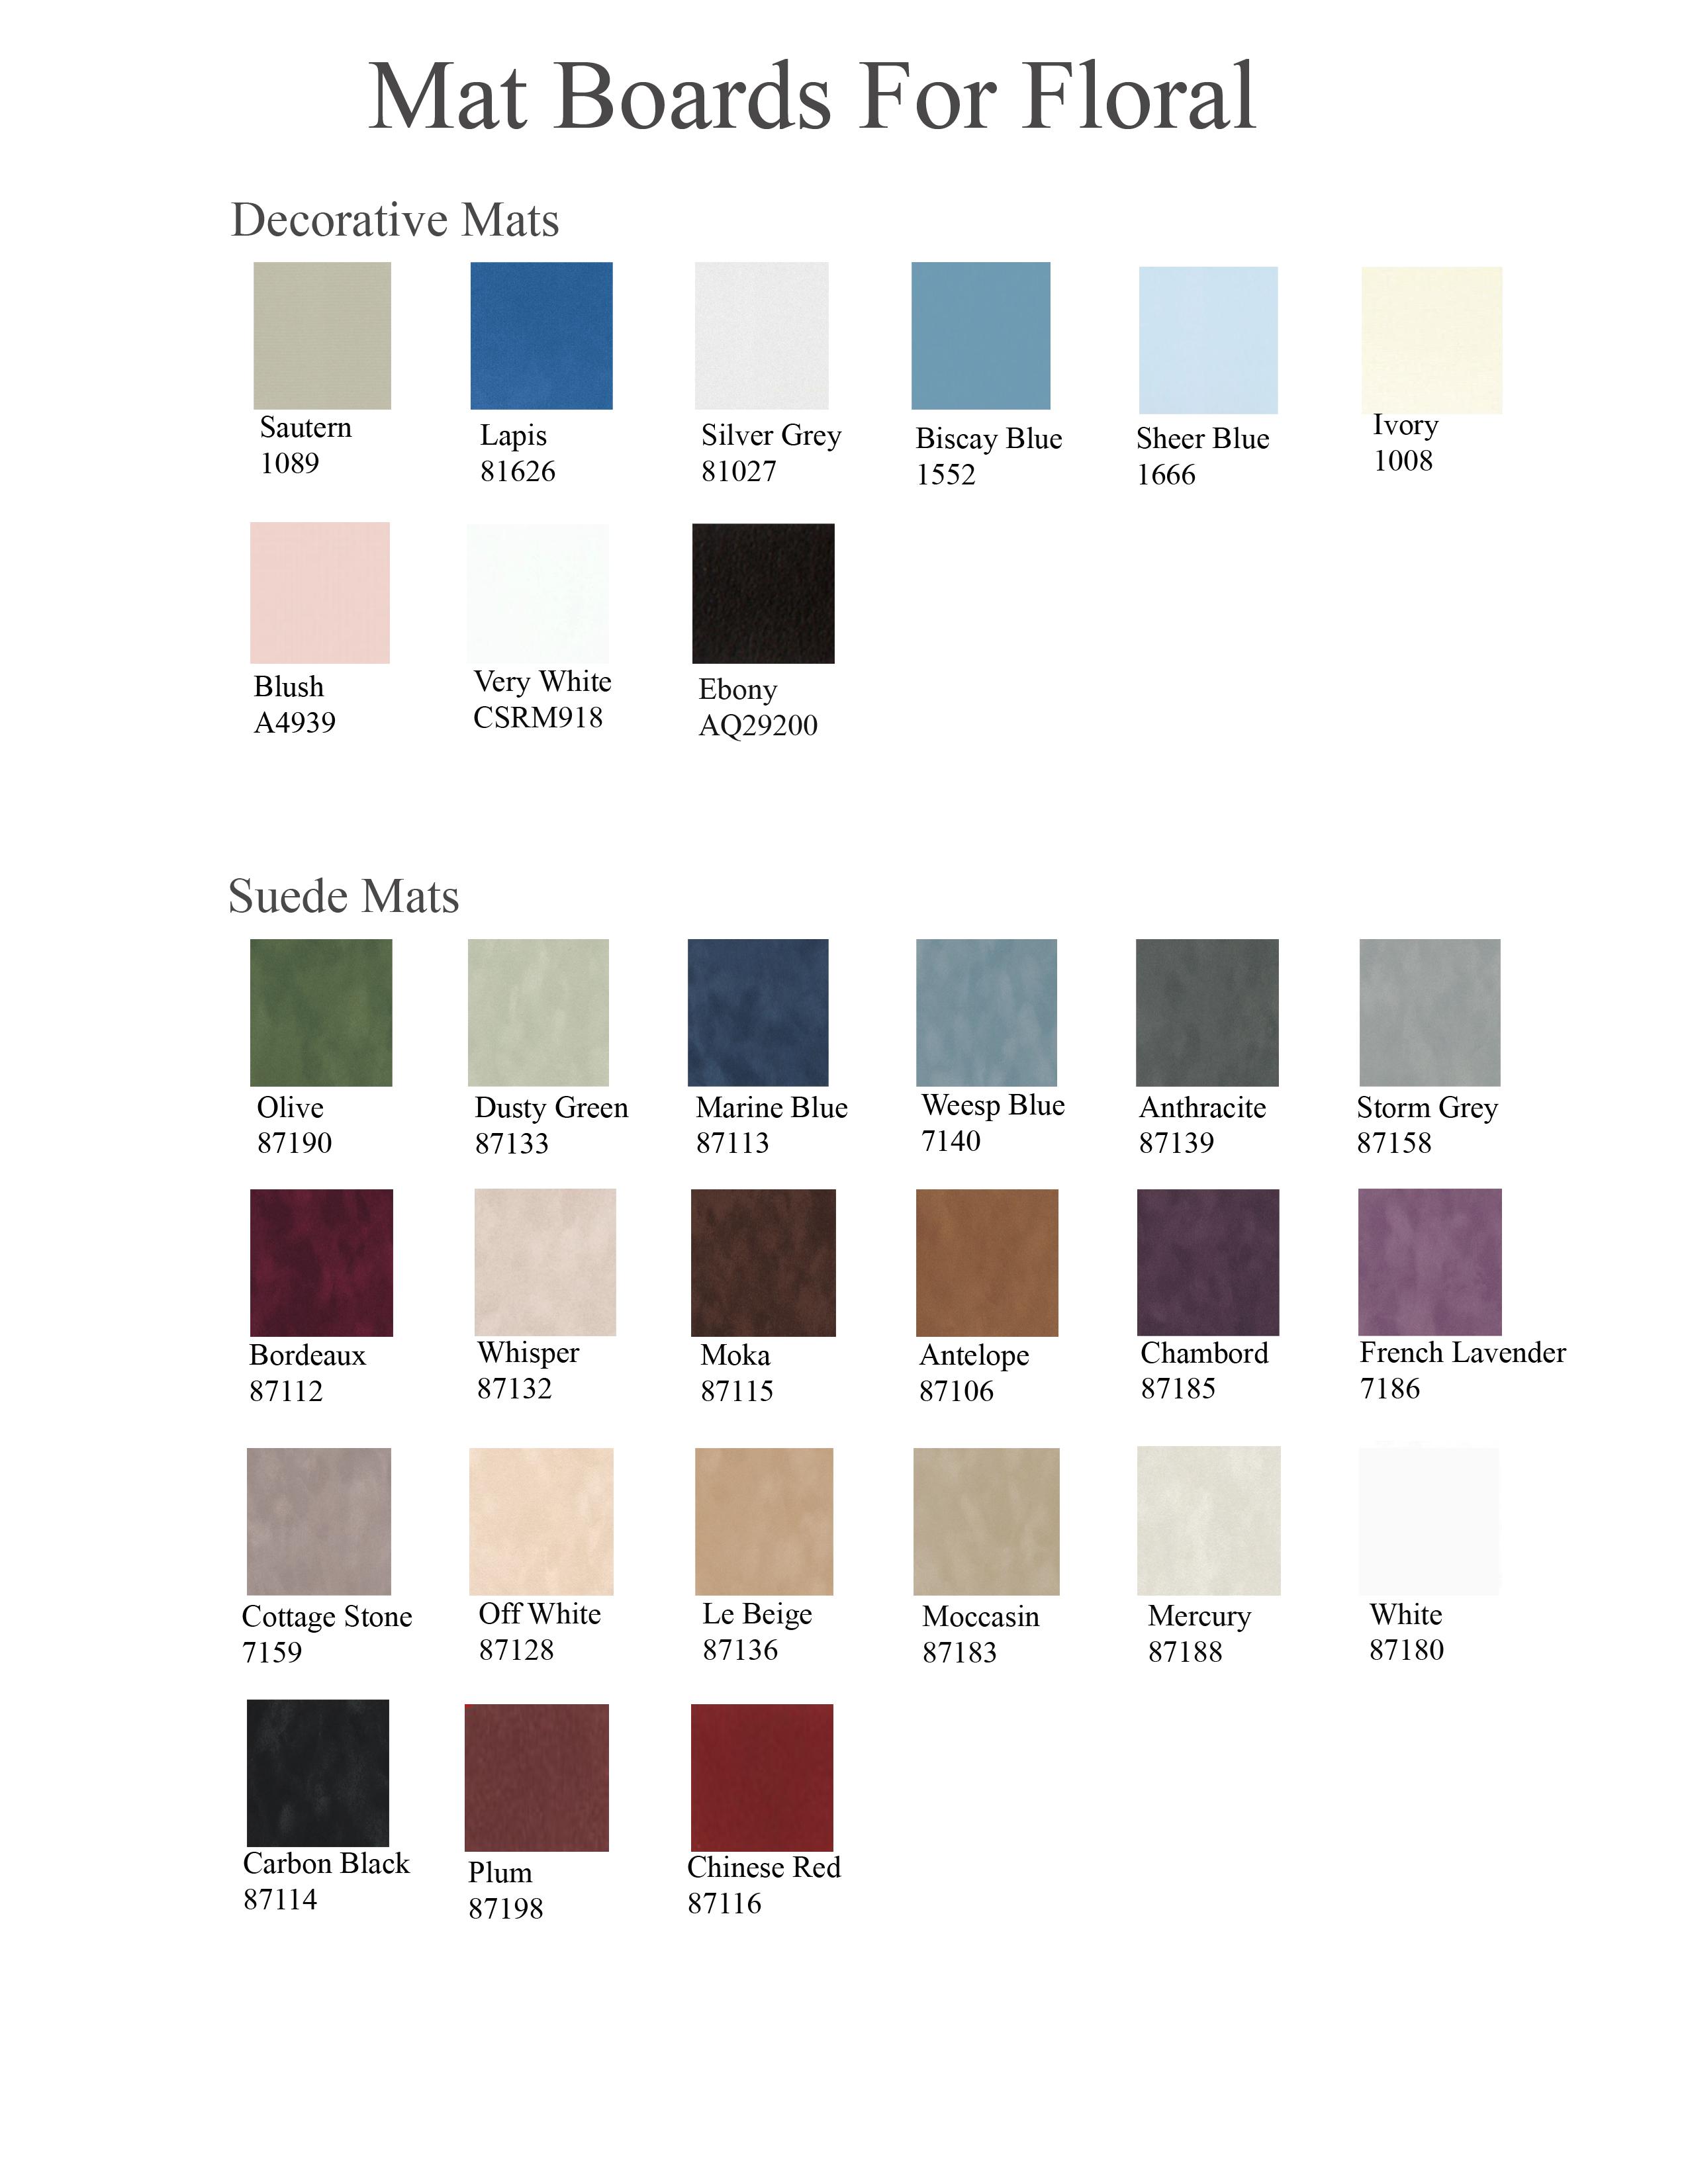 mats-colour-specs-feb-23-2021jpg.jpg